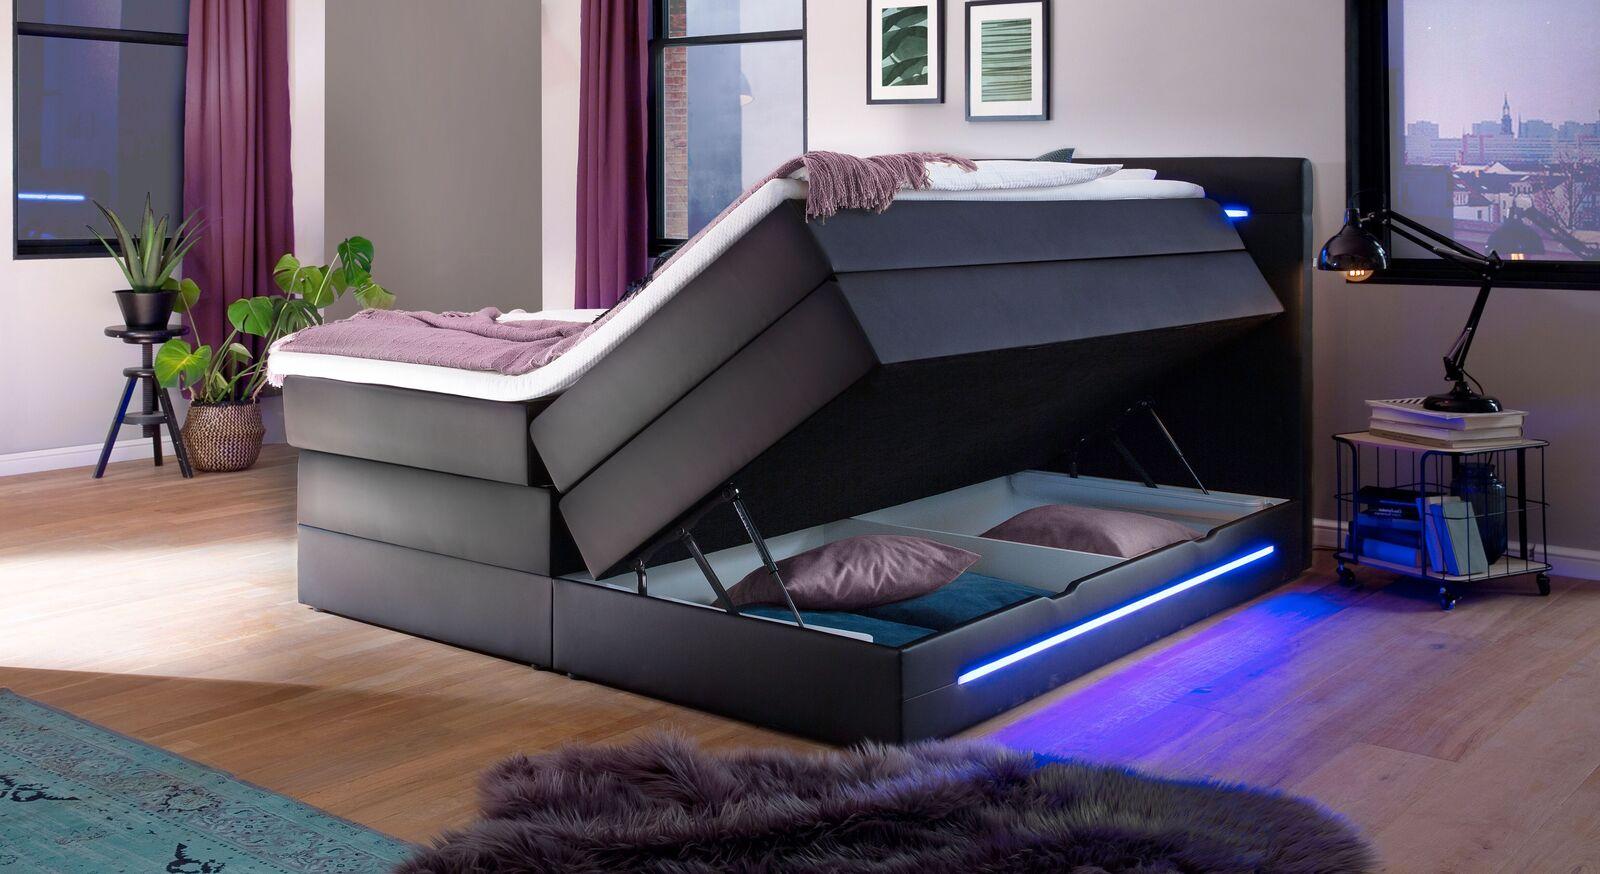 Bettkasten-Boxspringbett Tollocan mit LED-Beleuchtung